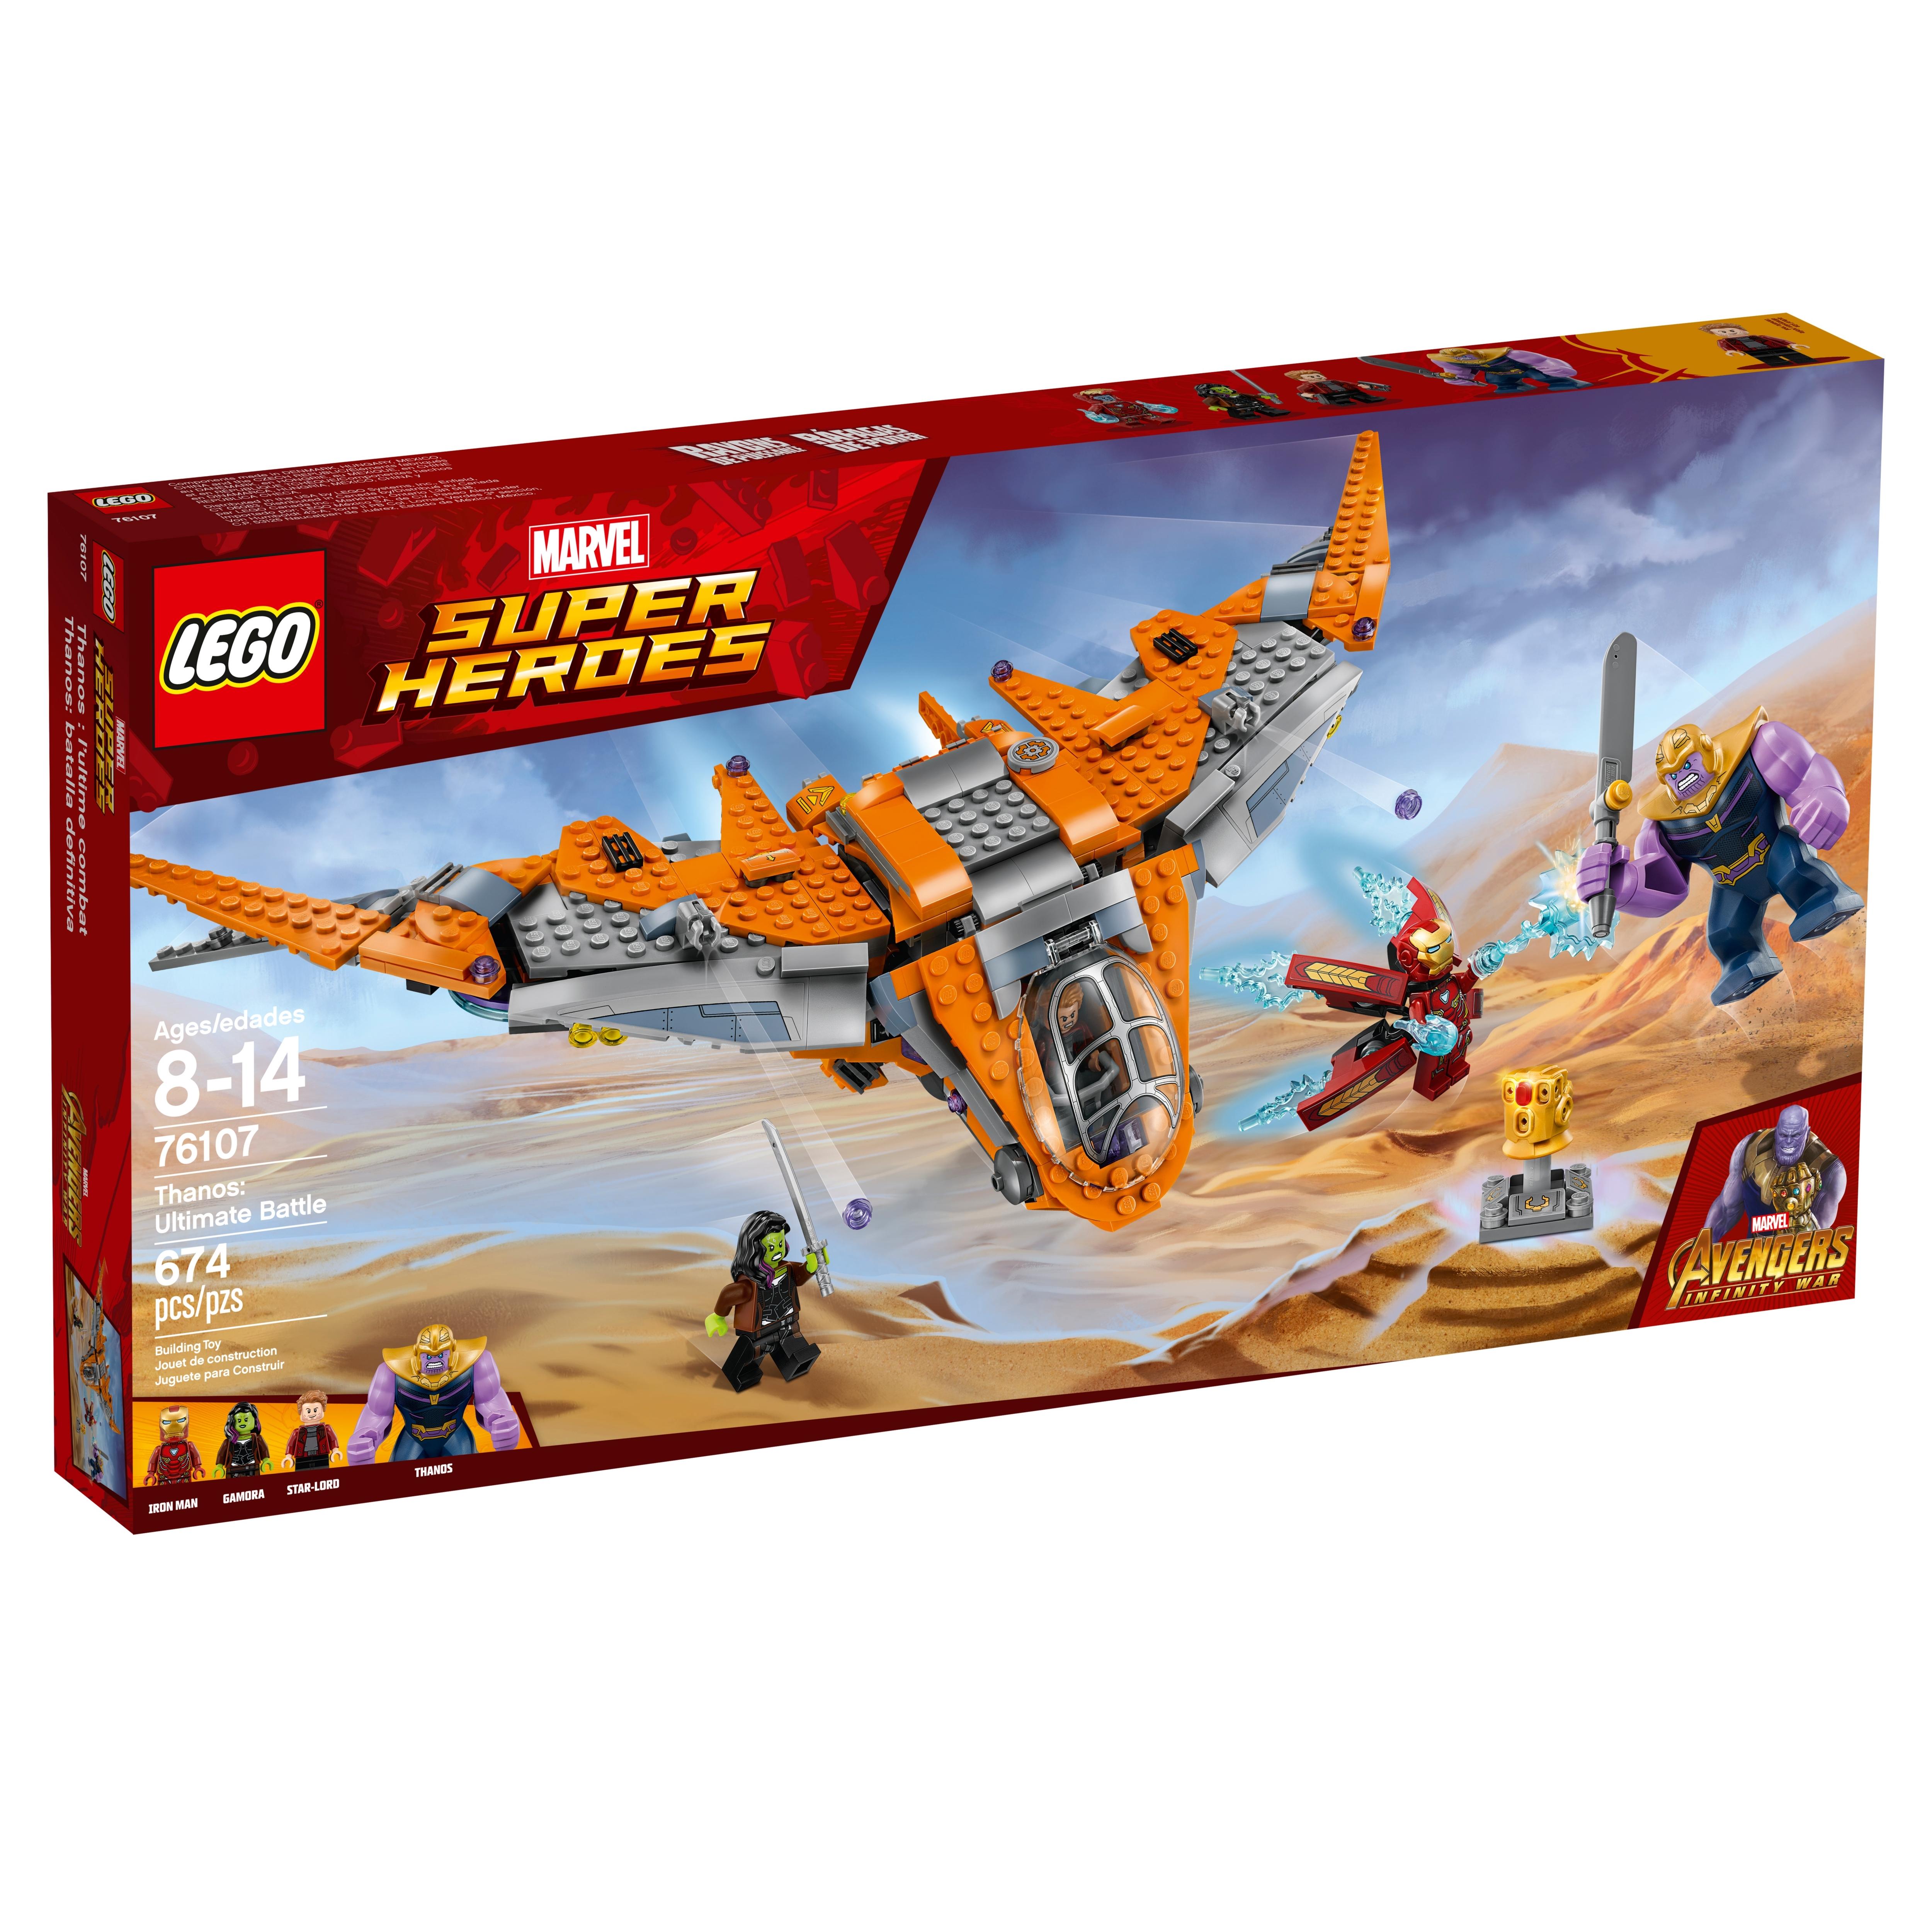 2018 New Lego Sets >> 76107 Thanos Ultimate Battle | Brickipedia | FANDOM powered by Wikia